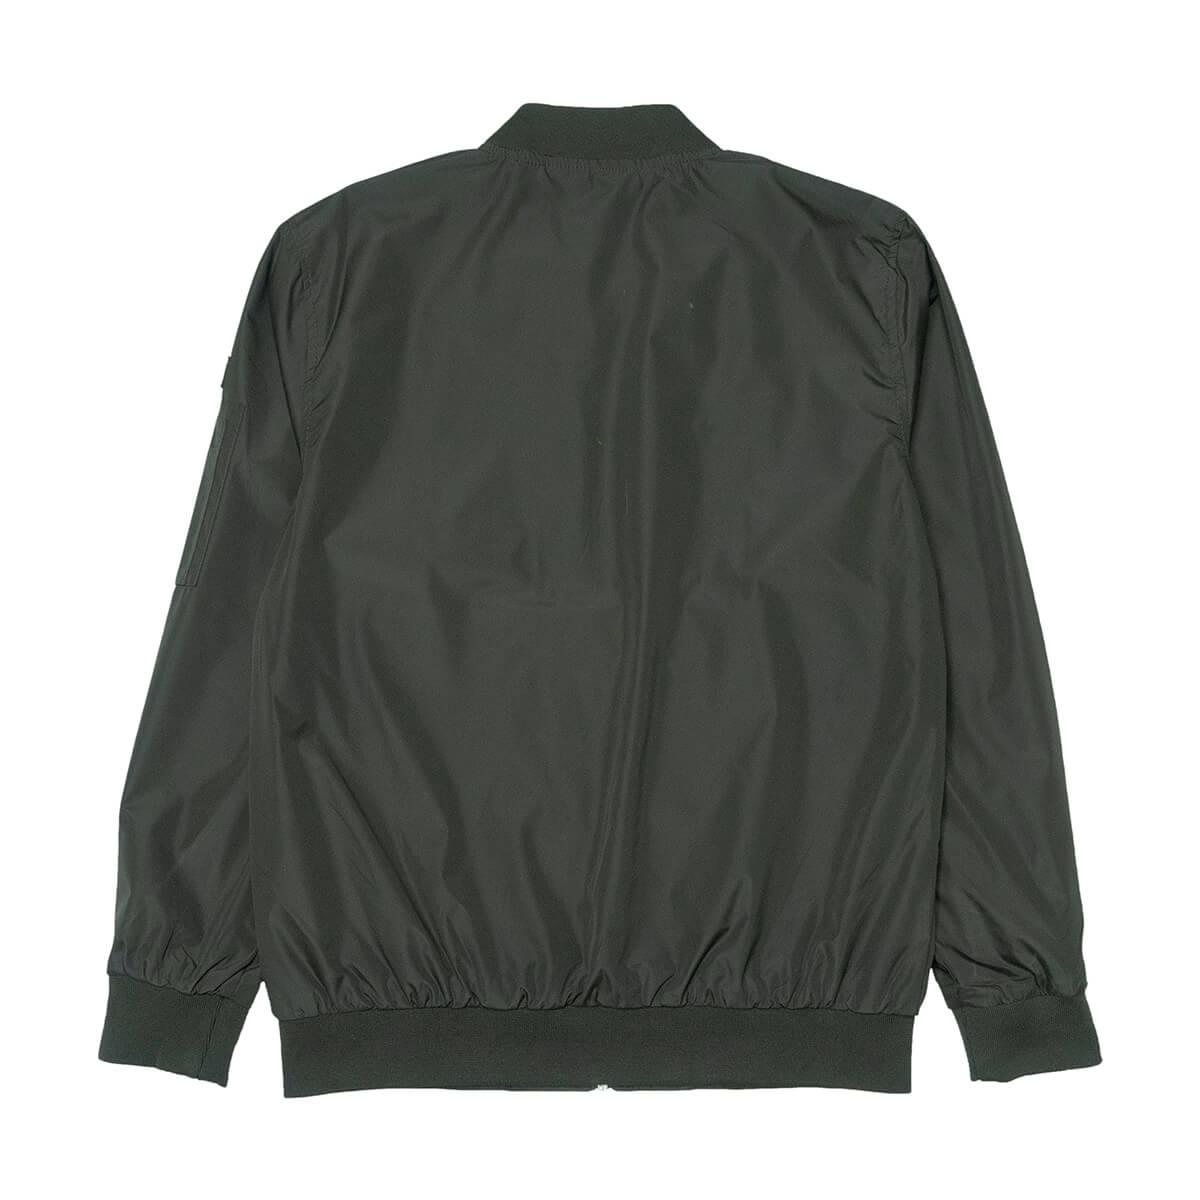 MA-1飛行外套 飛行夾克 空軍外套 防風外套 潮流時尚休閒外套 立領外套 黑色外套 MA-1 Flight Jacket Men's Jackets Casual Jackets (321-889-01)軍綠色、(321-889-02)黑色 M L XL (胸圍114~124公分  45~49英吋) 男 [實體店面保障] sun-e 2